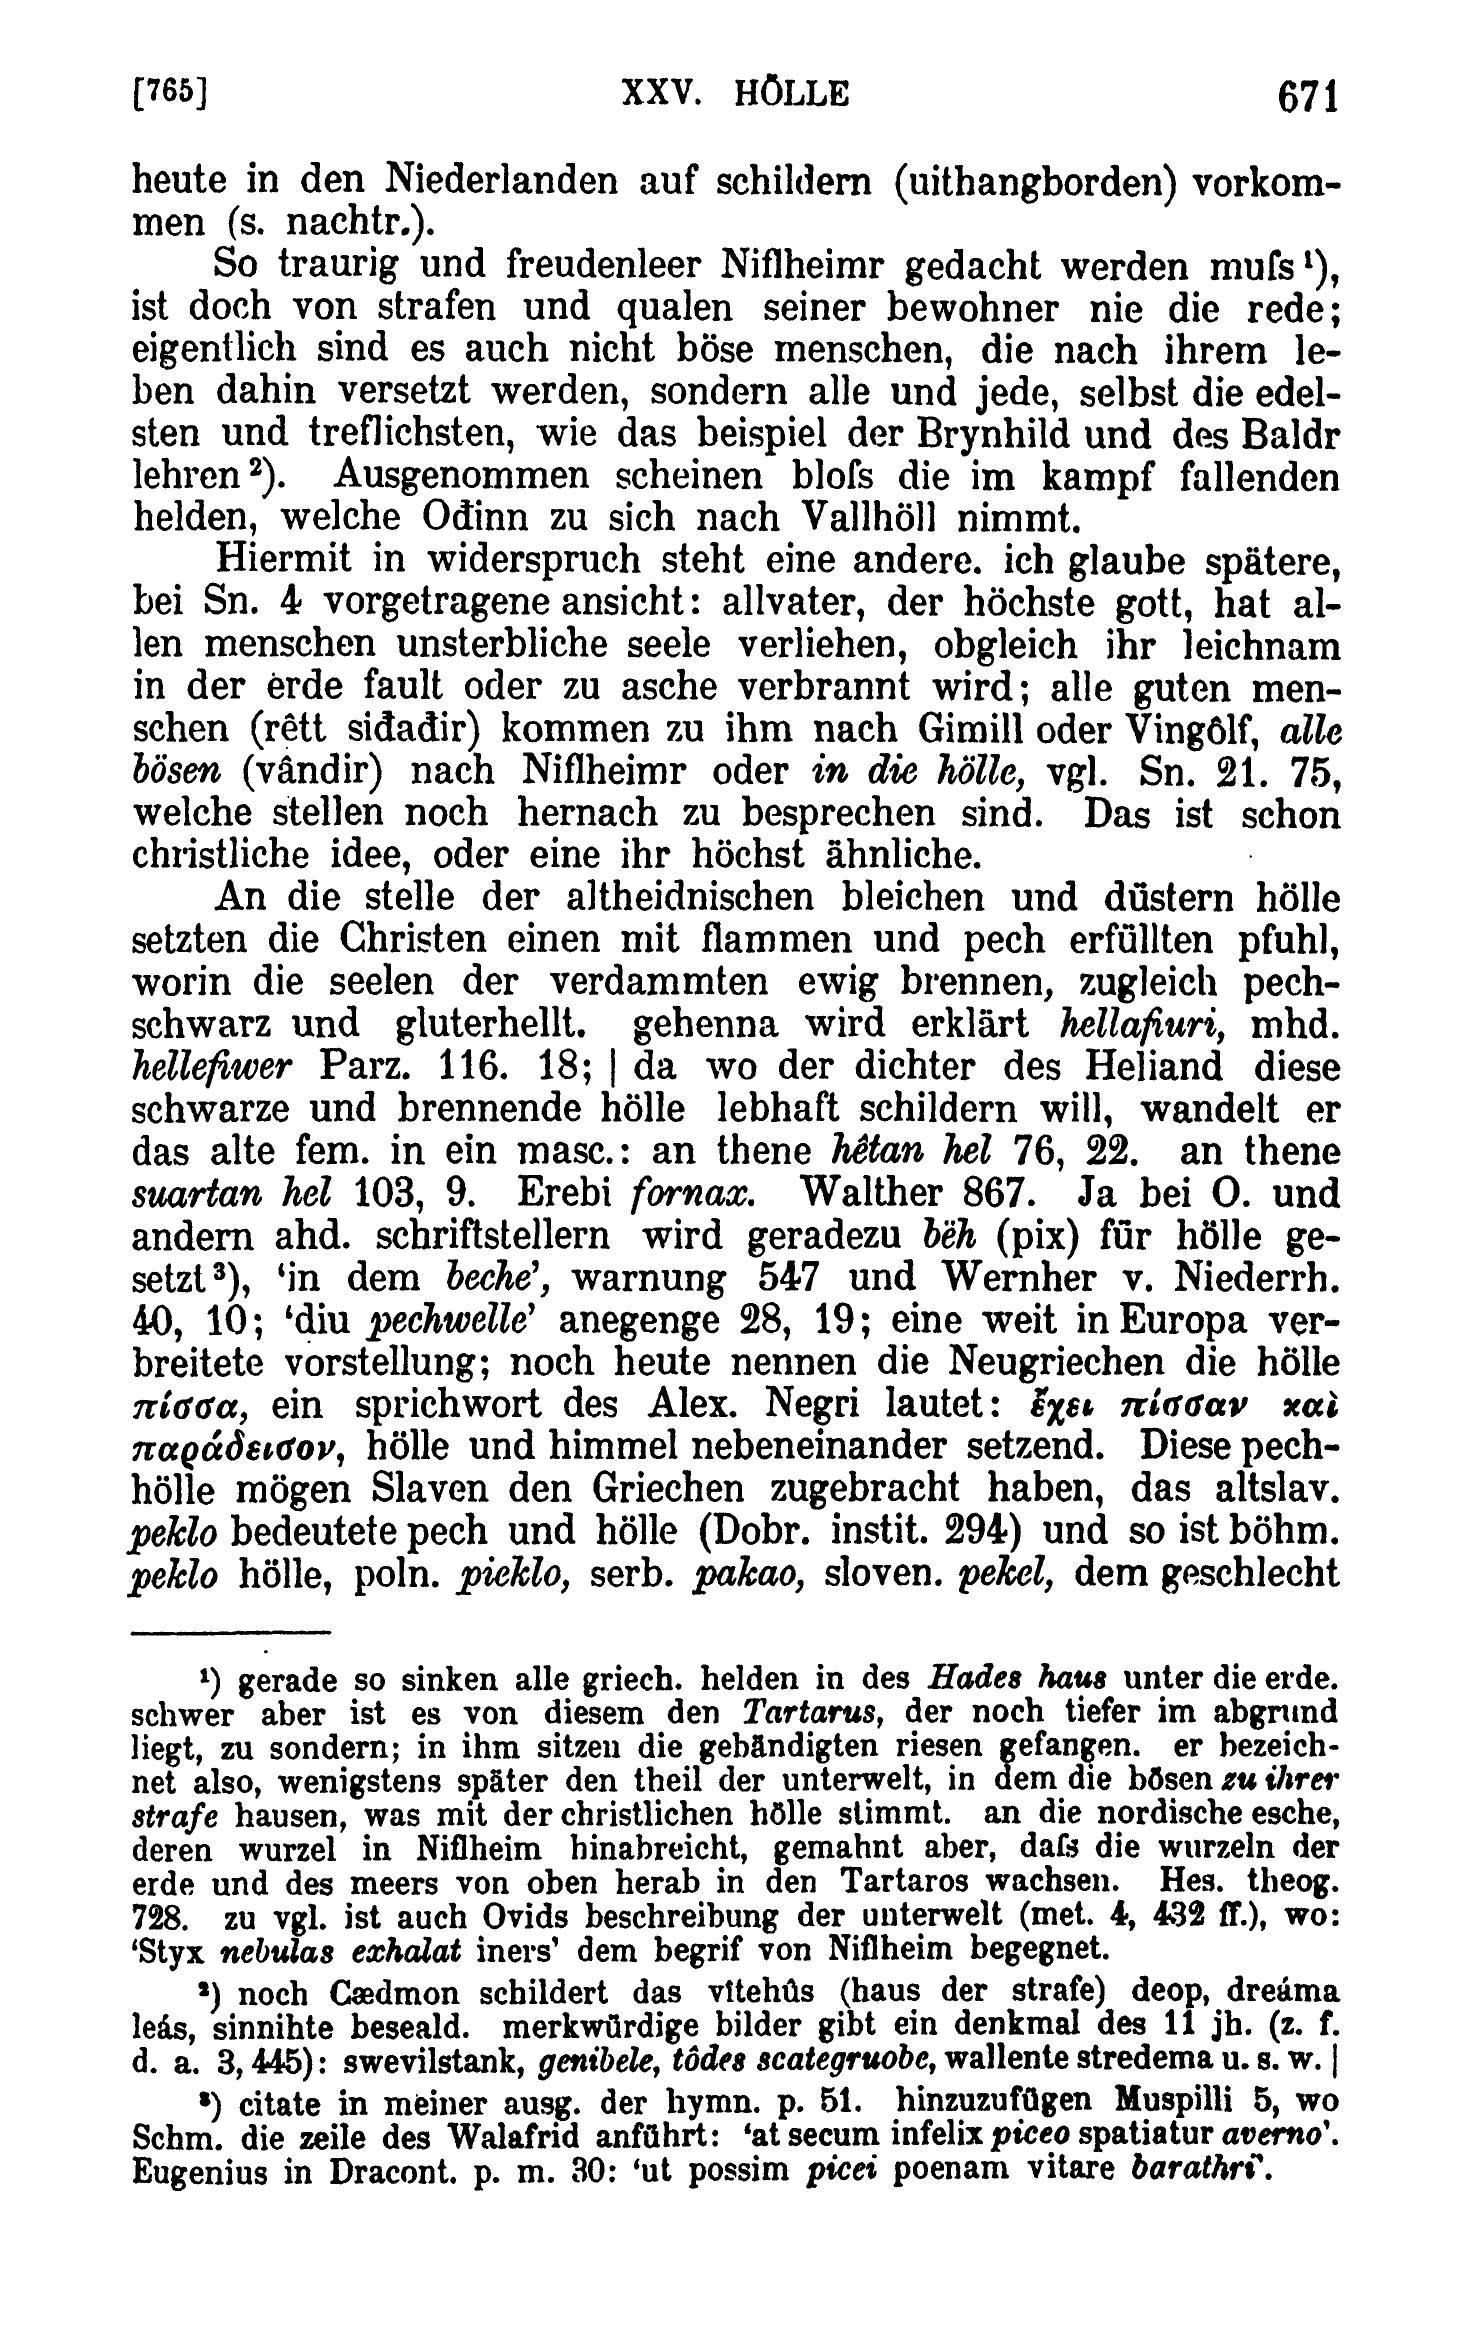 File:Deutsche Mythologie (Grimm) V2 135.jpg - Wikimedia Commons